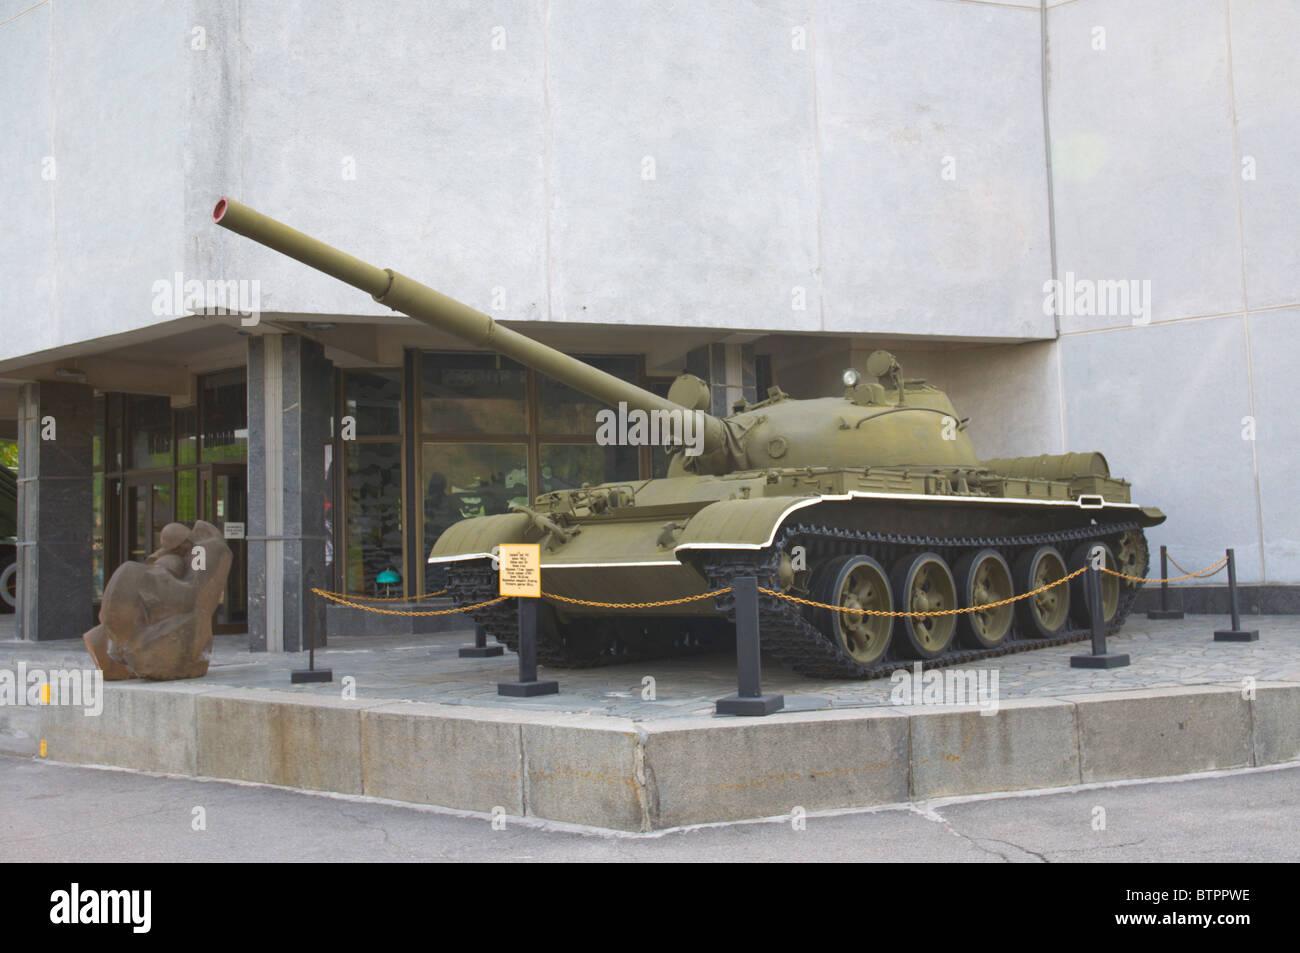 Tank at Great Patriotic War (World War II) open air museum Kiev Ukraine Europe - Stock Image